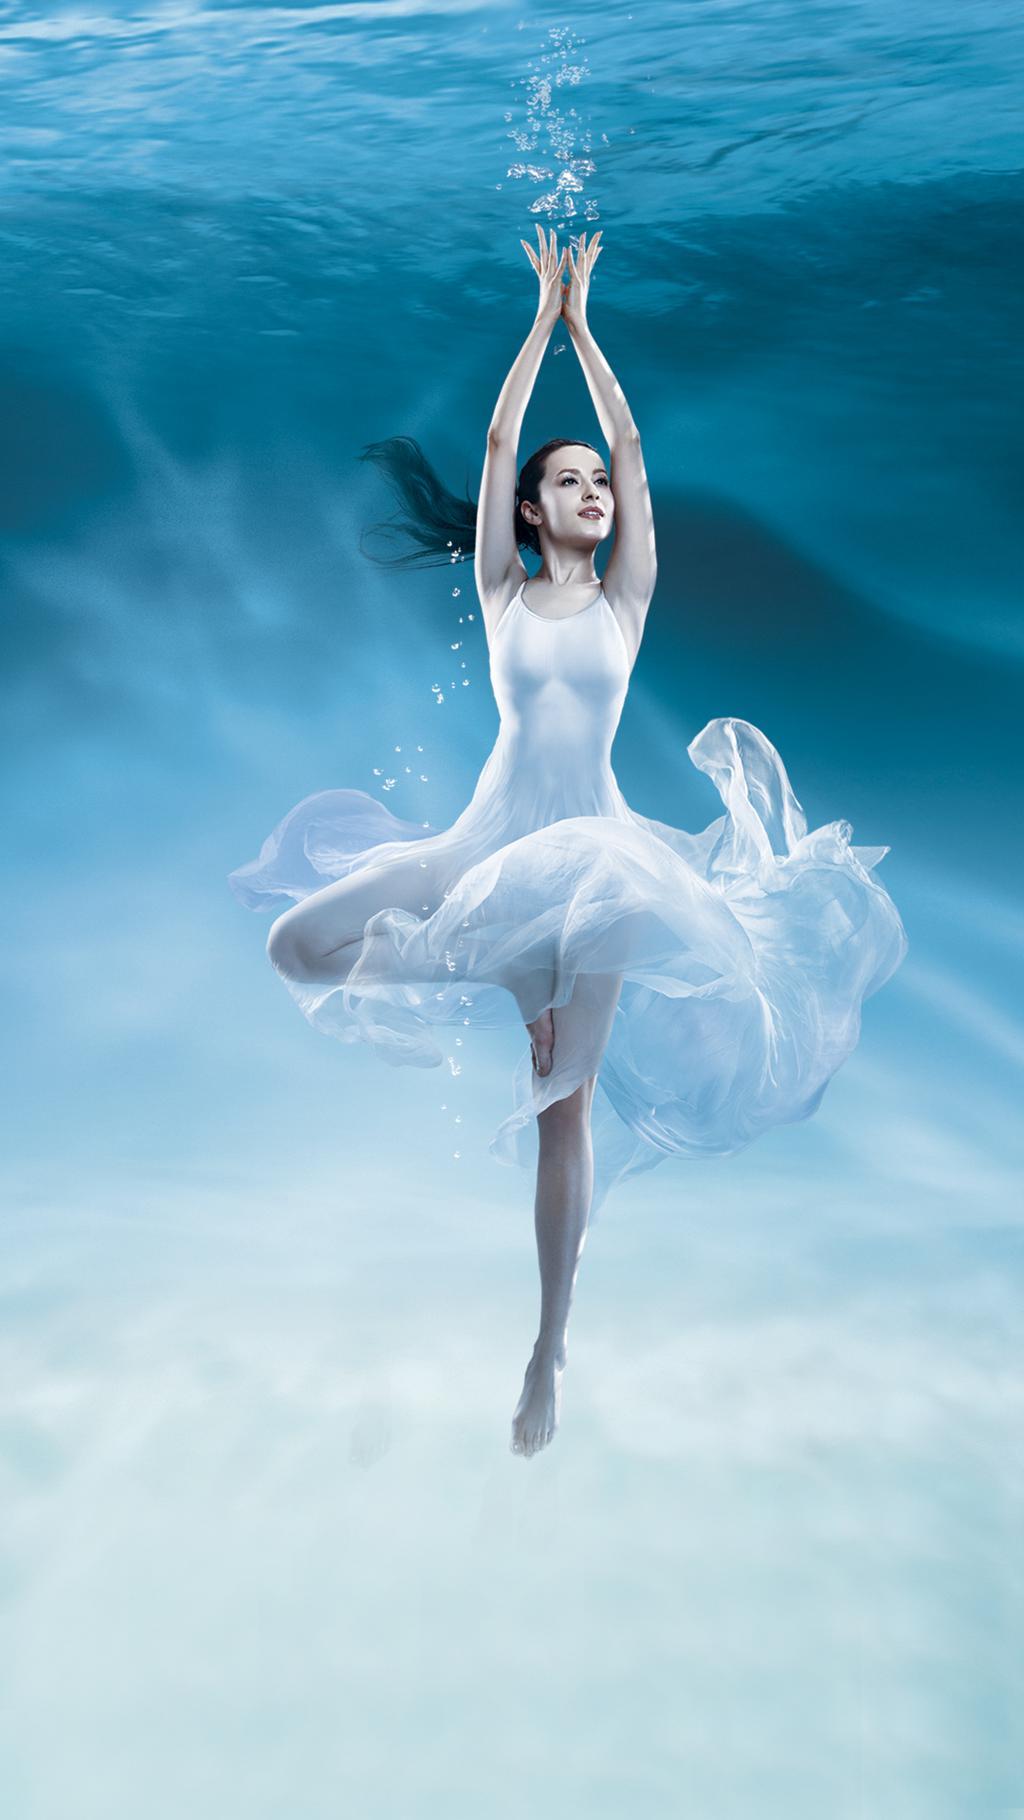 S4 Wallpaper Hd 海底舞蹈美女 锁屏图片 手机壁纸 女性 回车桌面